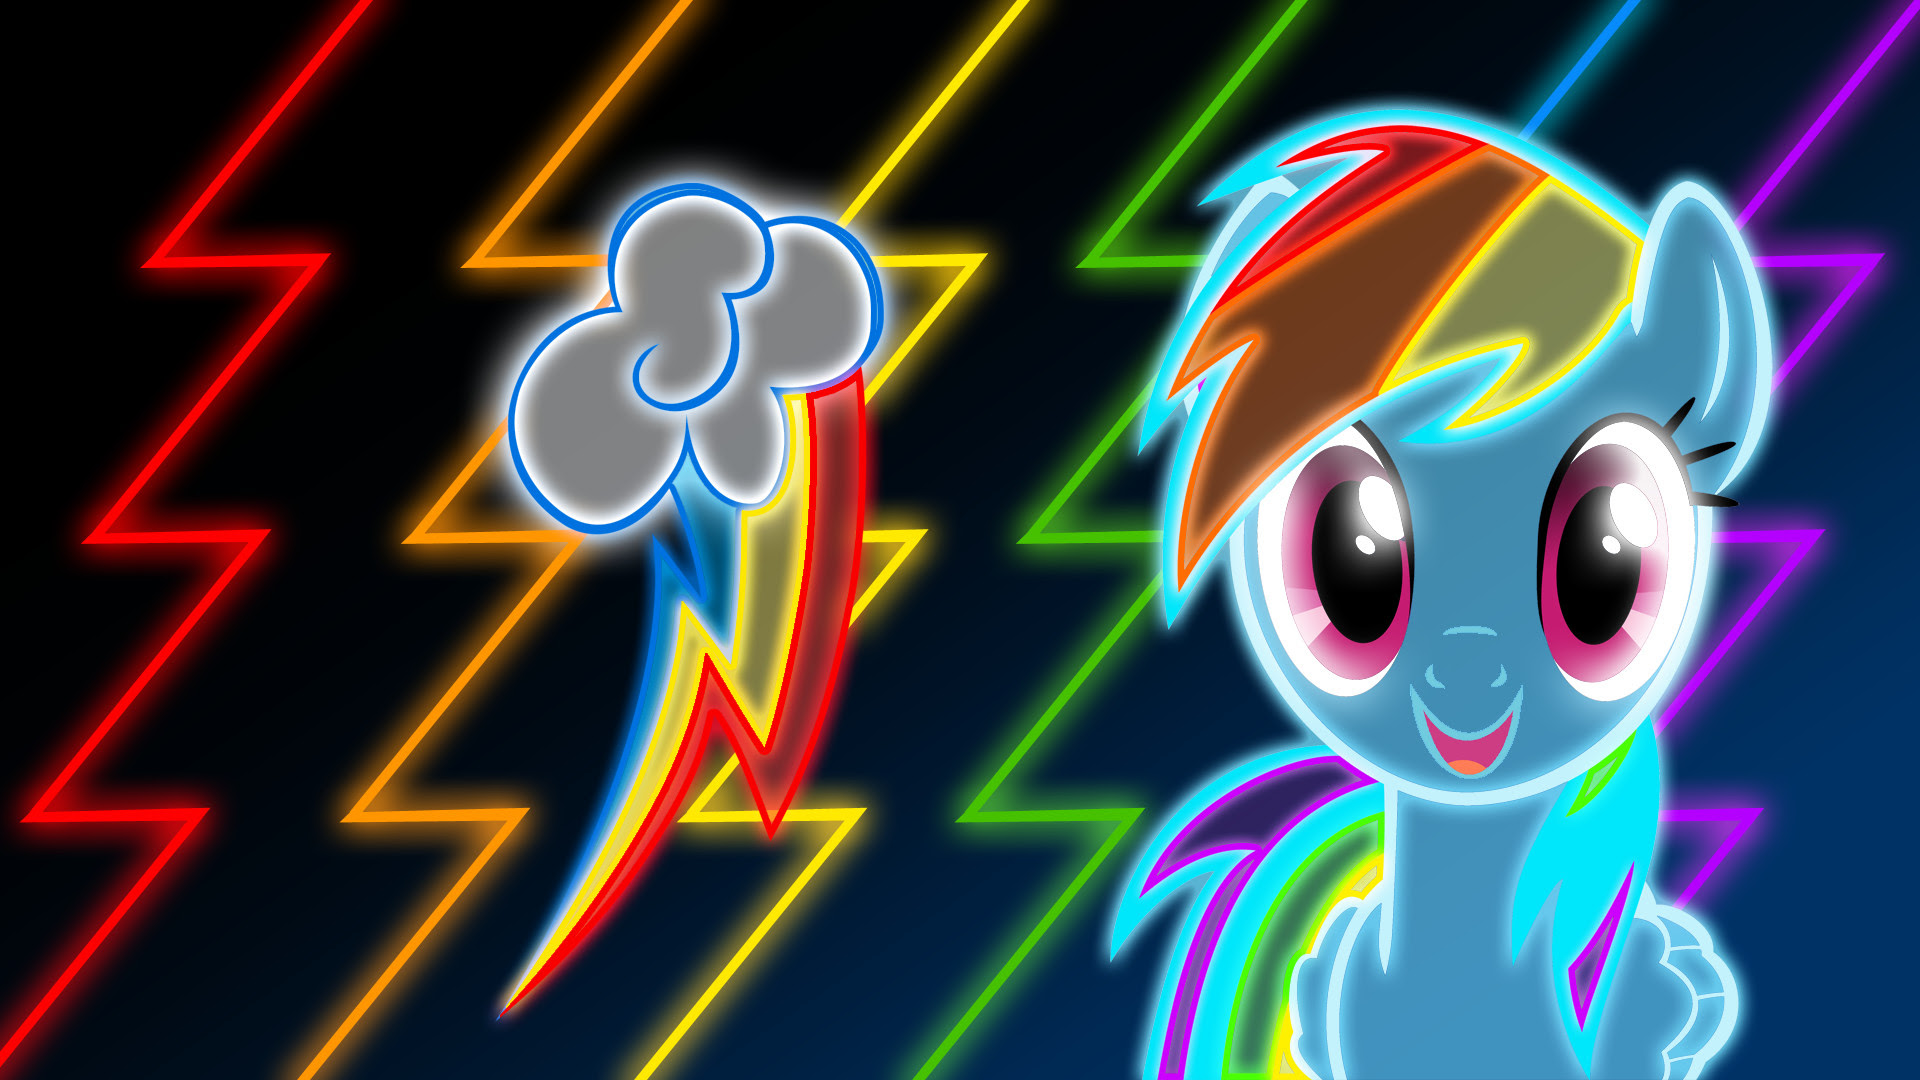 Rainbow Dash Neon Wallpaper 80 Images